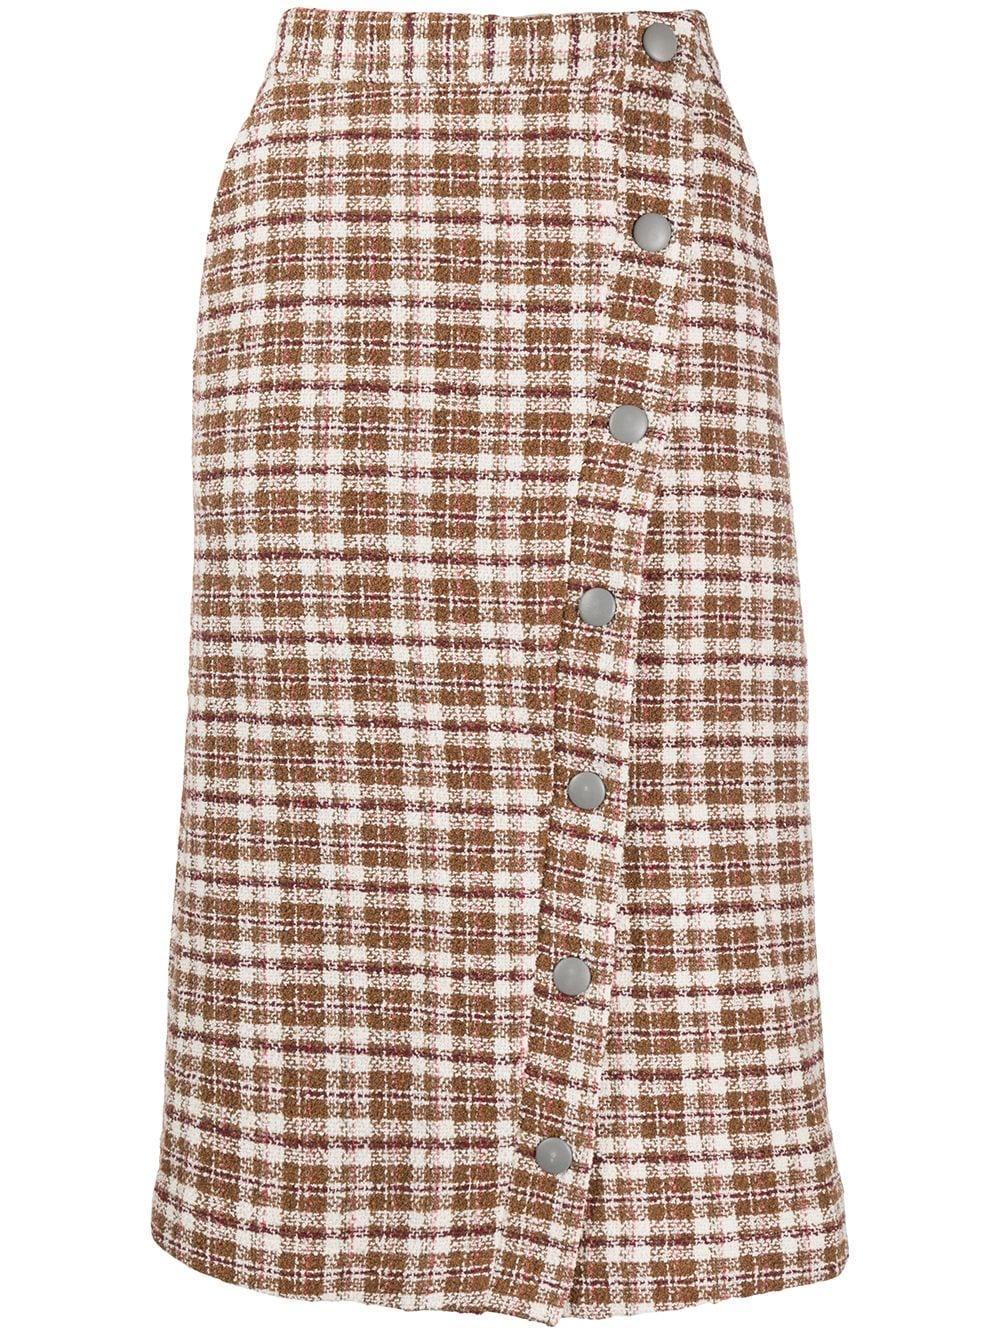 Remain plaid tweed pencil skirt